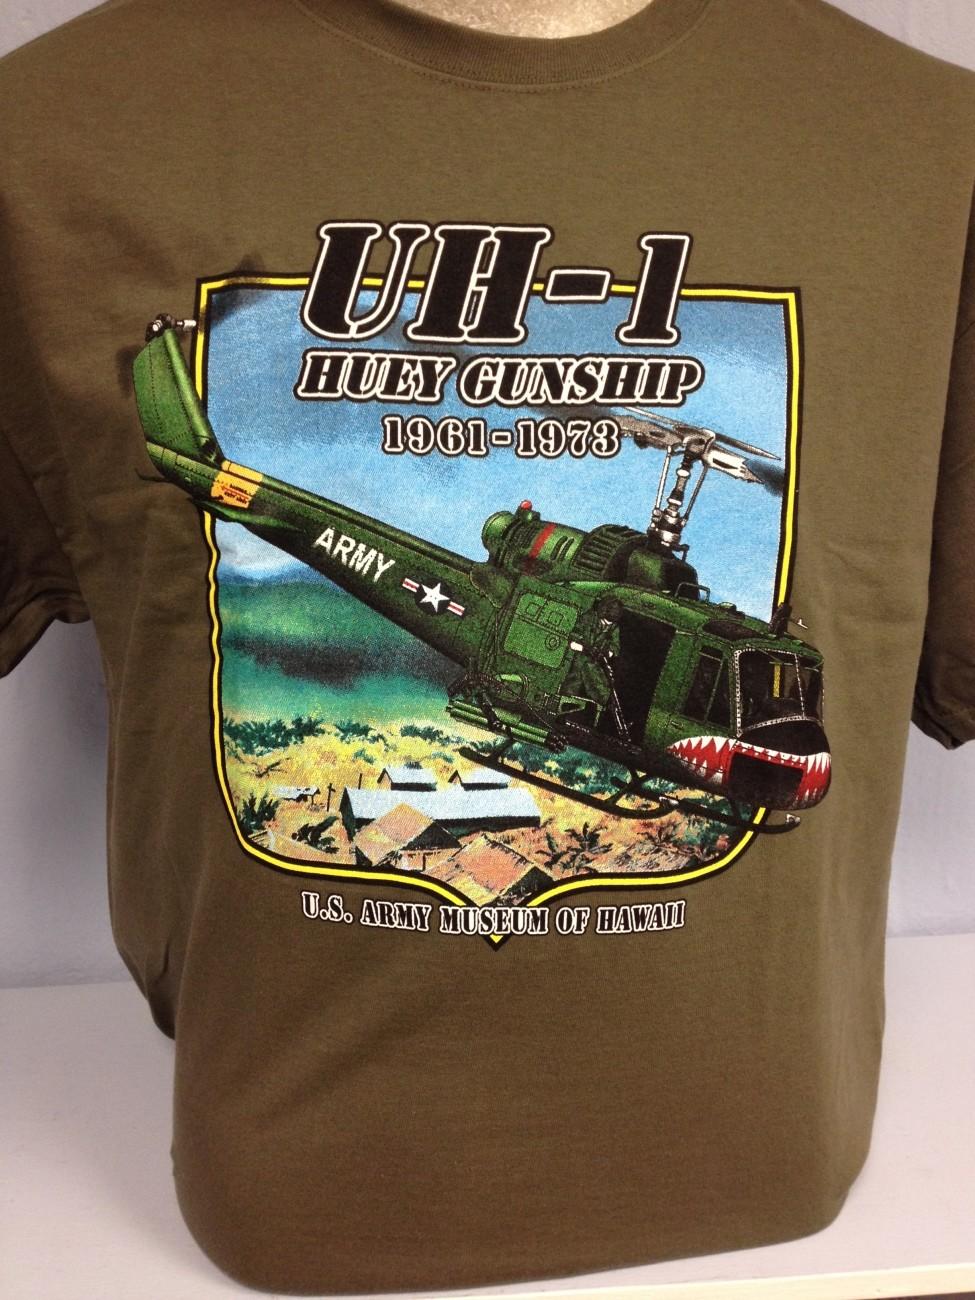 UH-1 Huey Gunship 1961-1973 T-Shirt - Adult